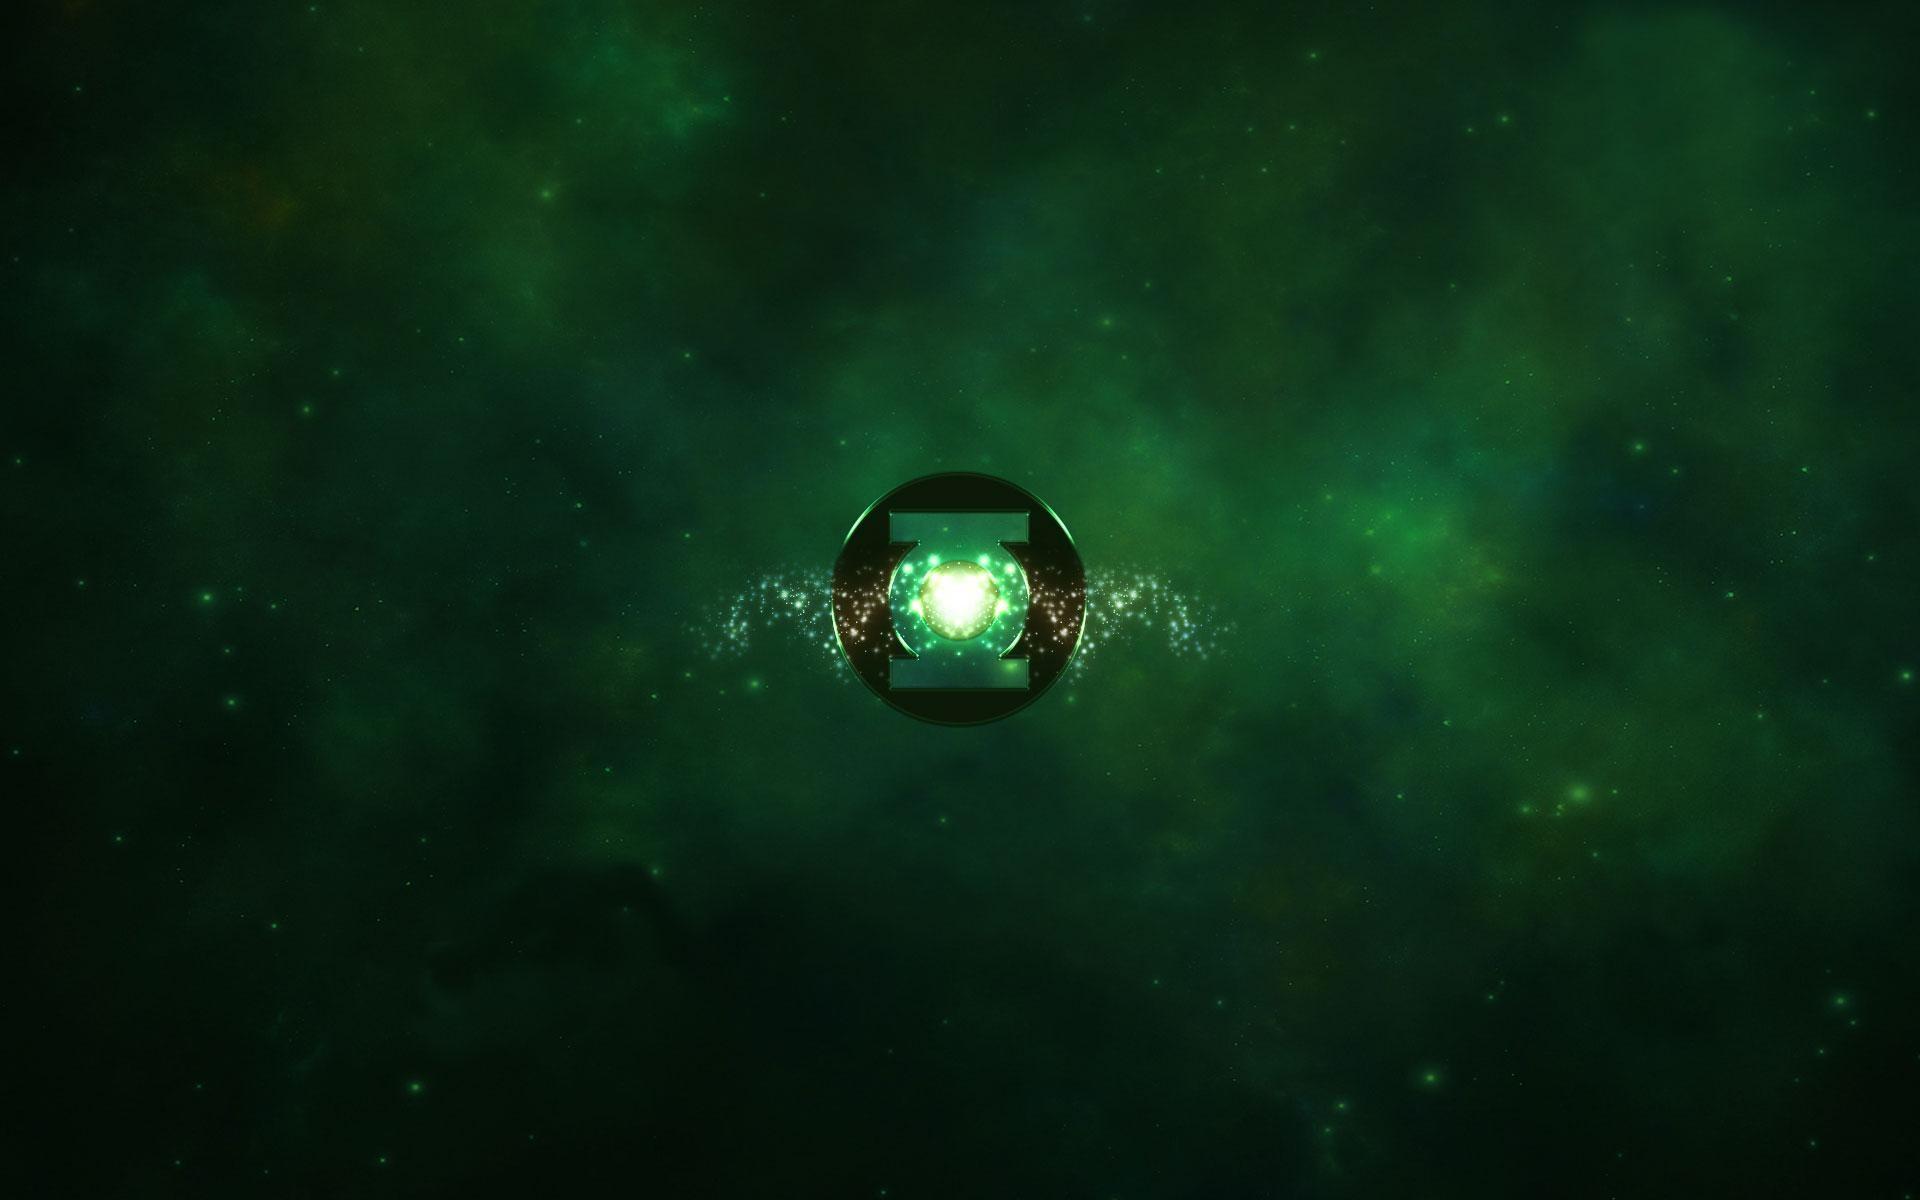 Green Lantern Computer Wallpapers, Desktop Backgrounds 1920×1200 Green  Lantern Wallpapers (39 Wallpapers